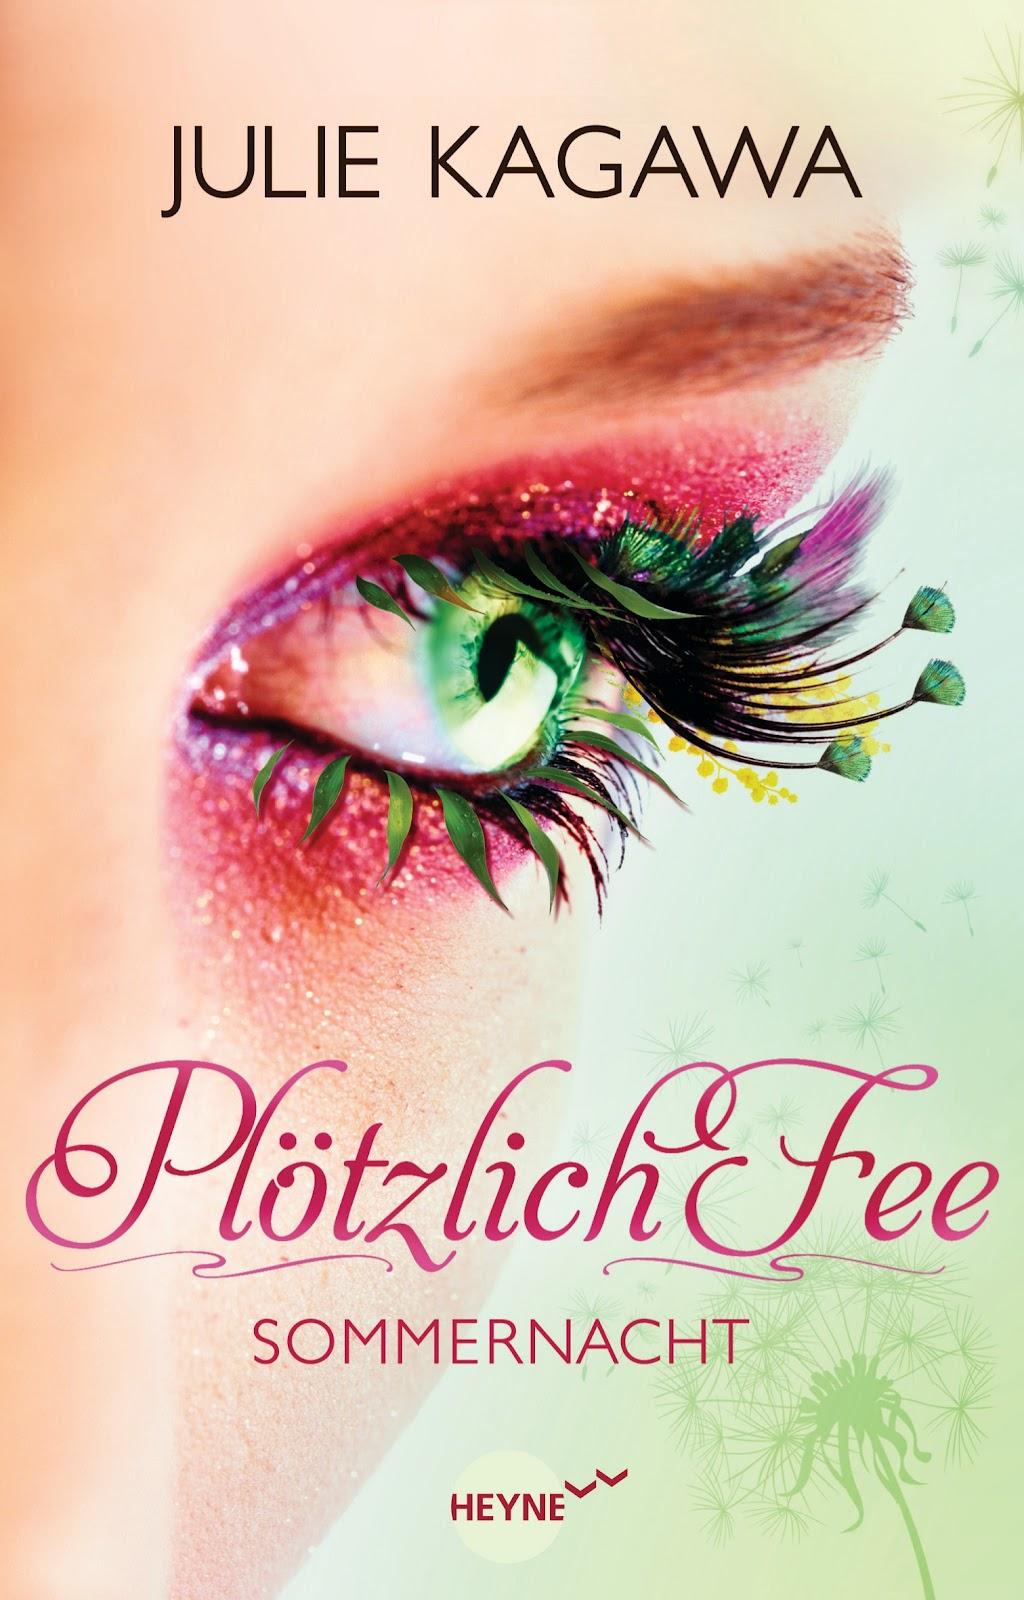 Photography Book Cover Fee : Enchanted books rezension plötzlich fee